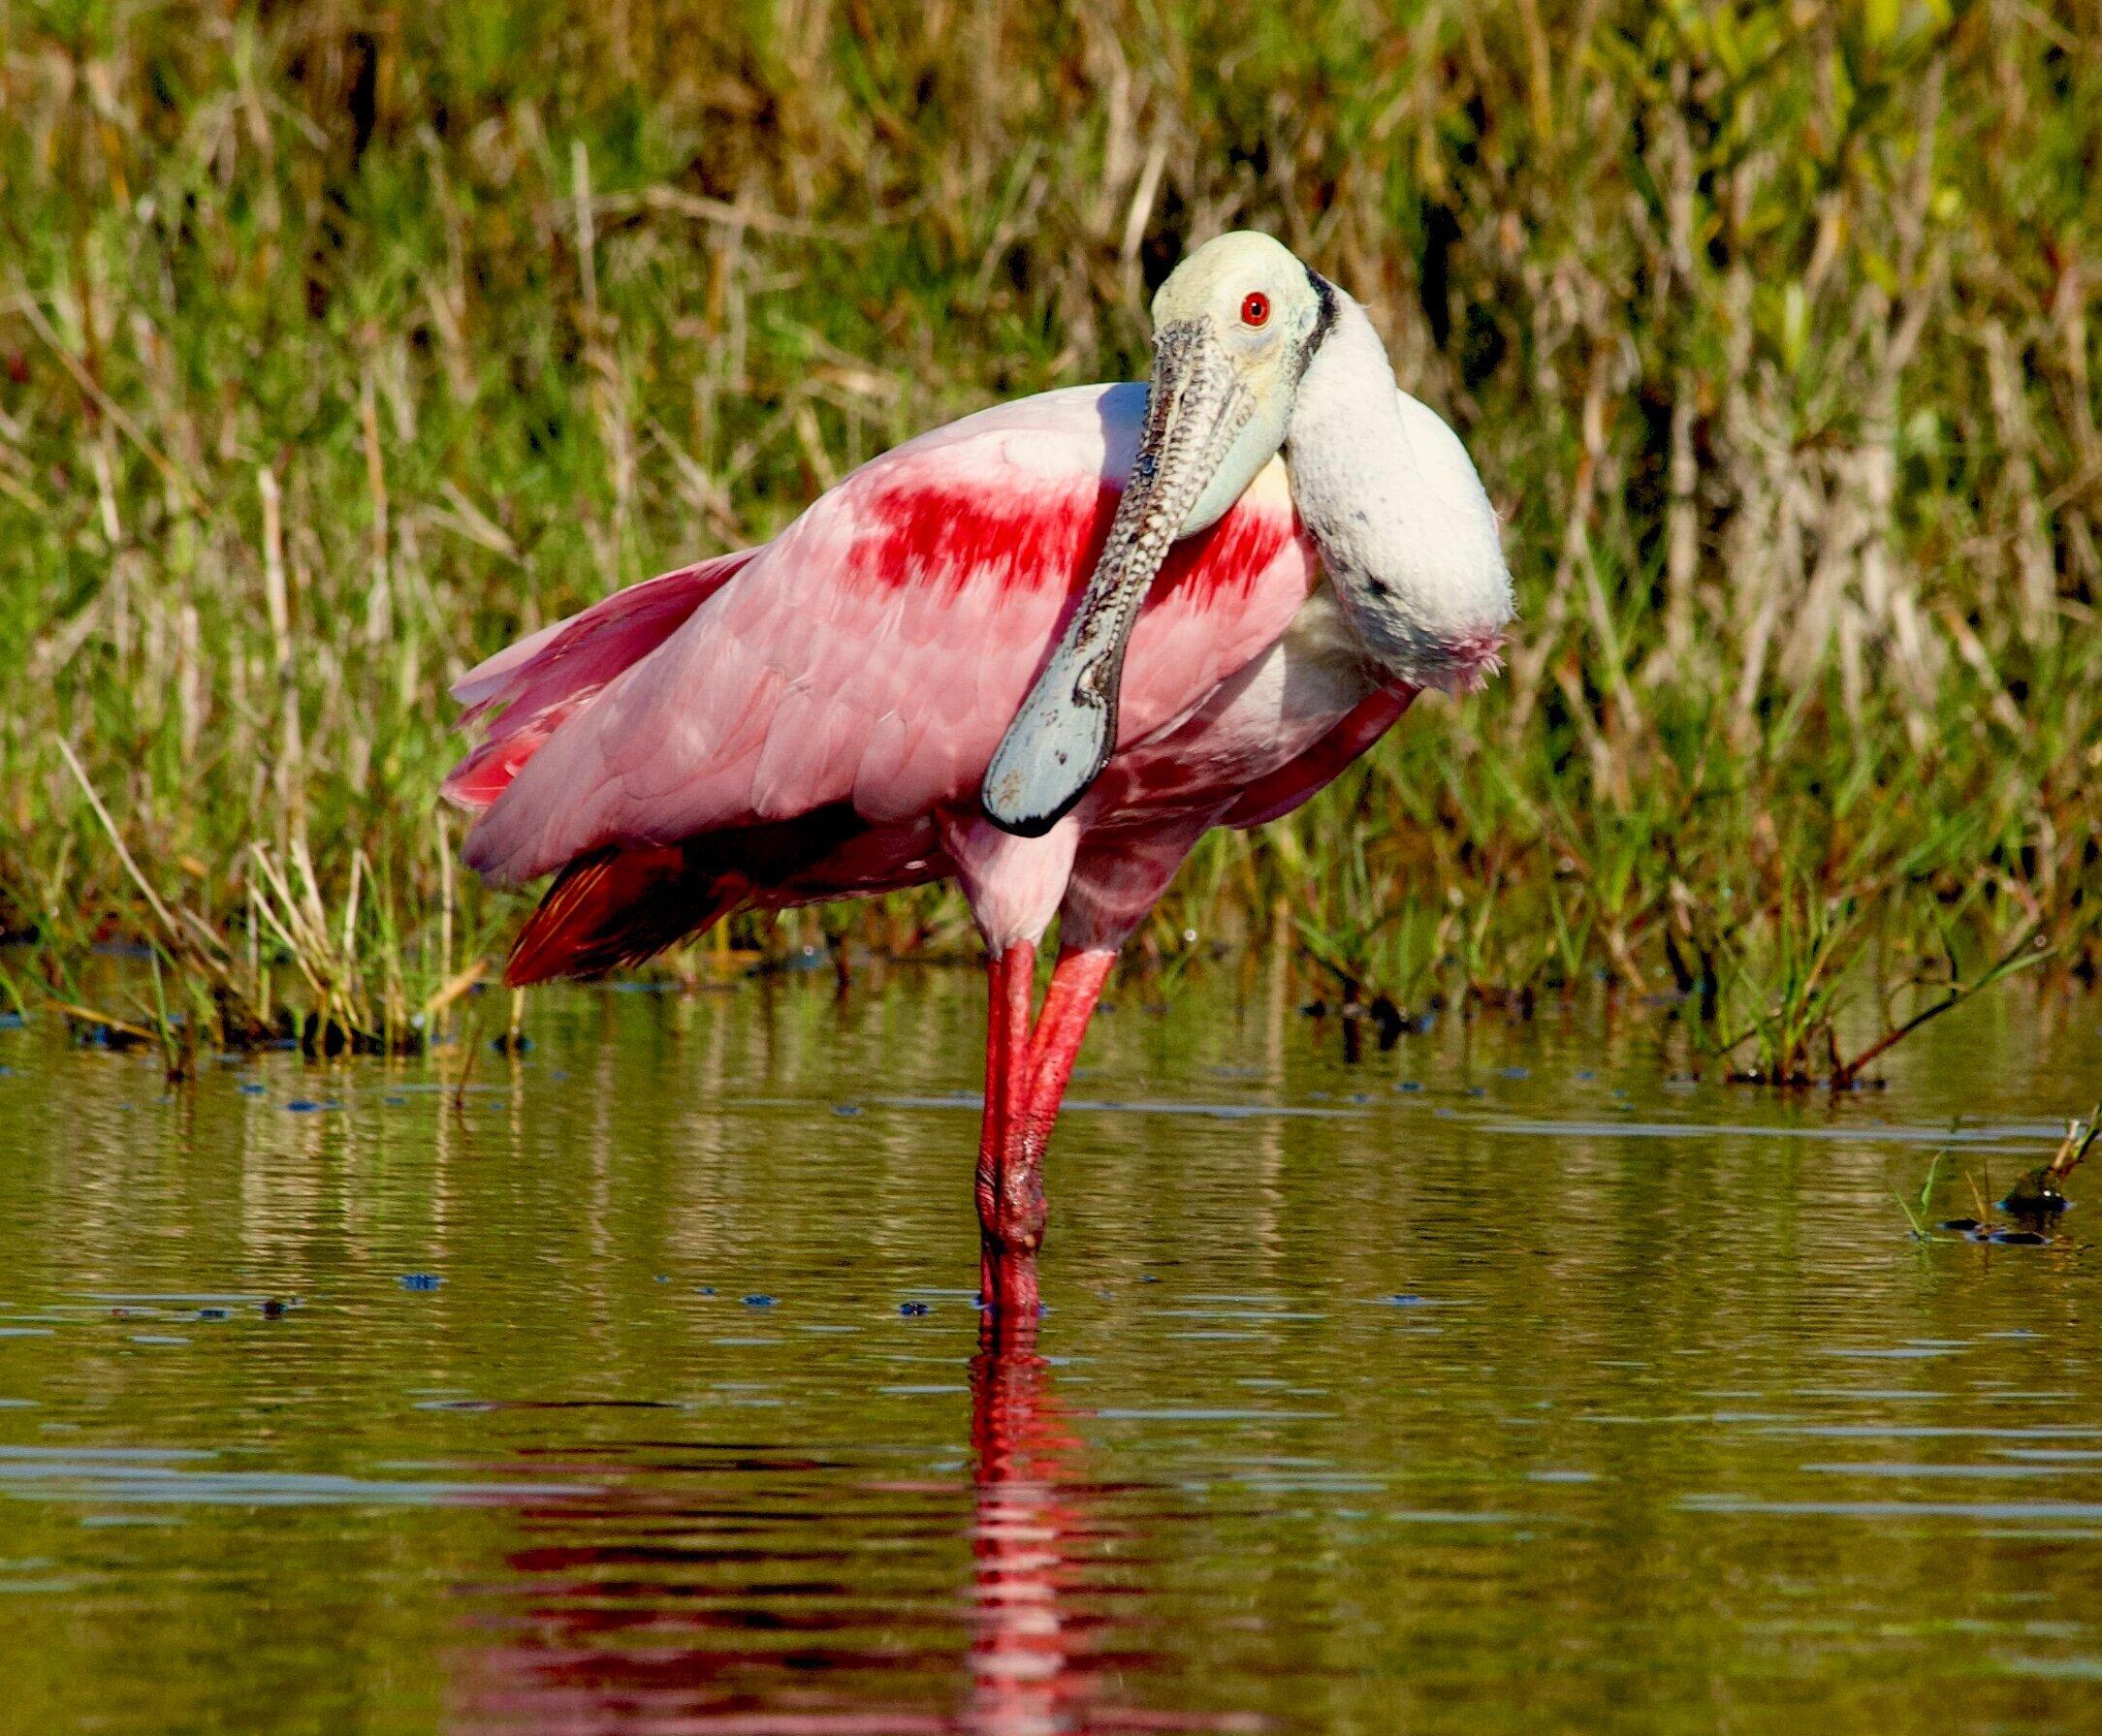 Exploring Florida's Merritt Island National Wildlife Refuge